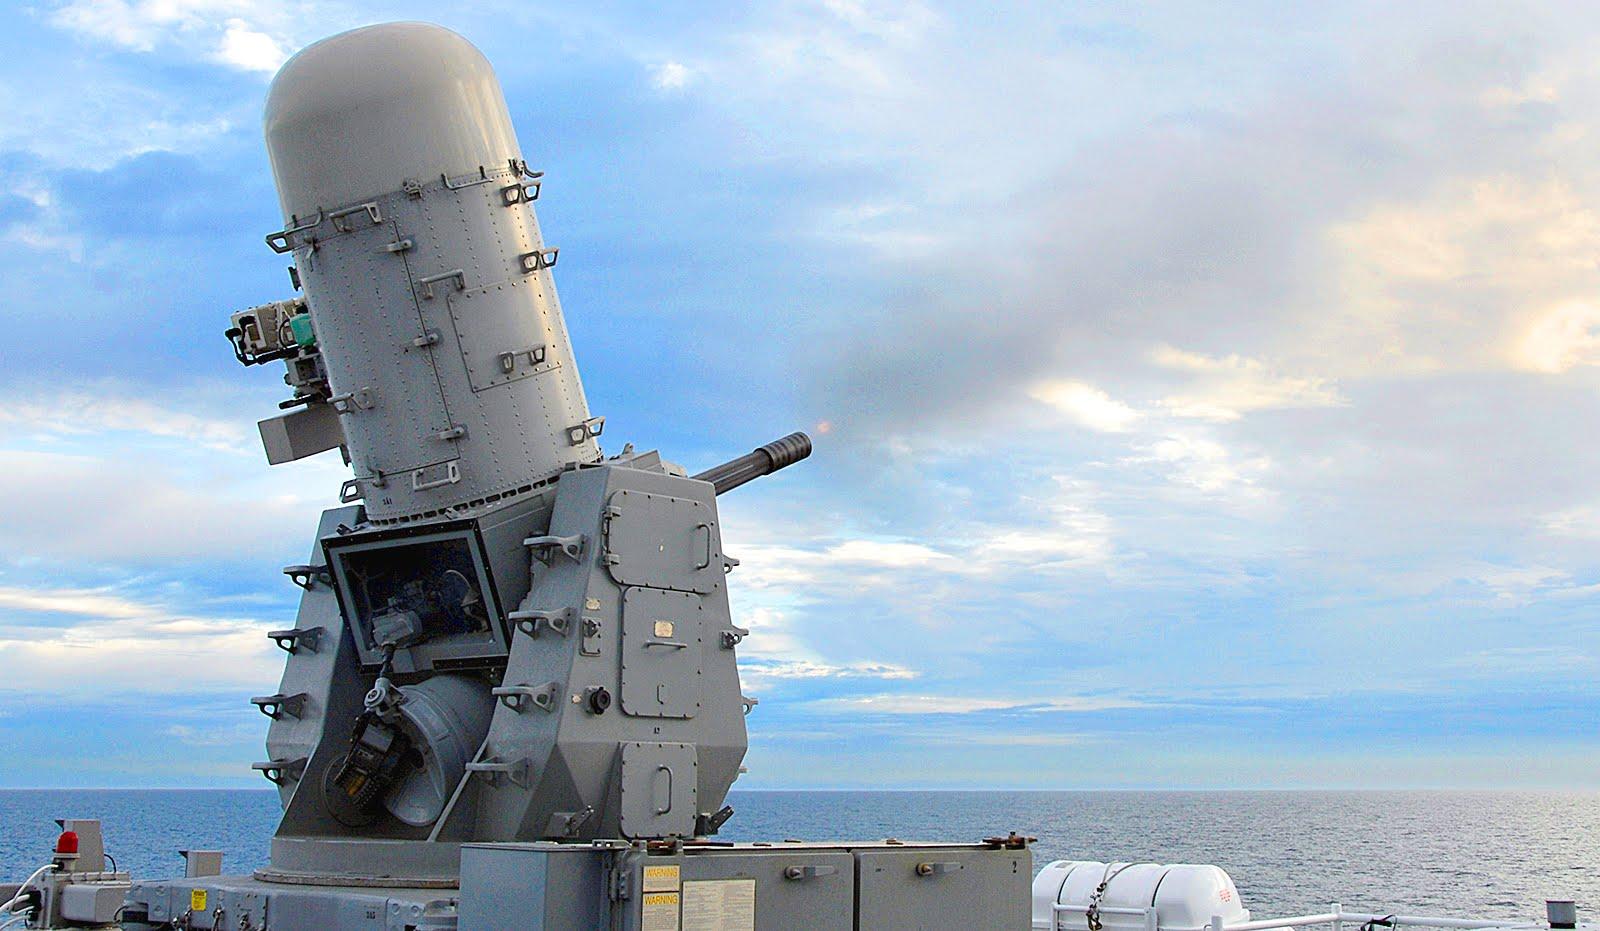 Tough SF: Battleships of the Future